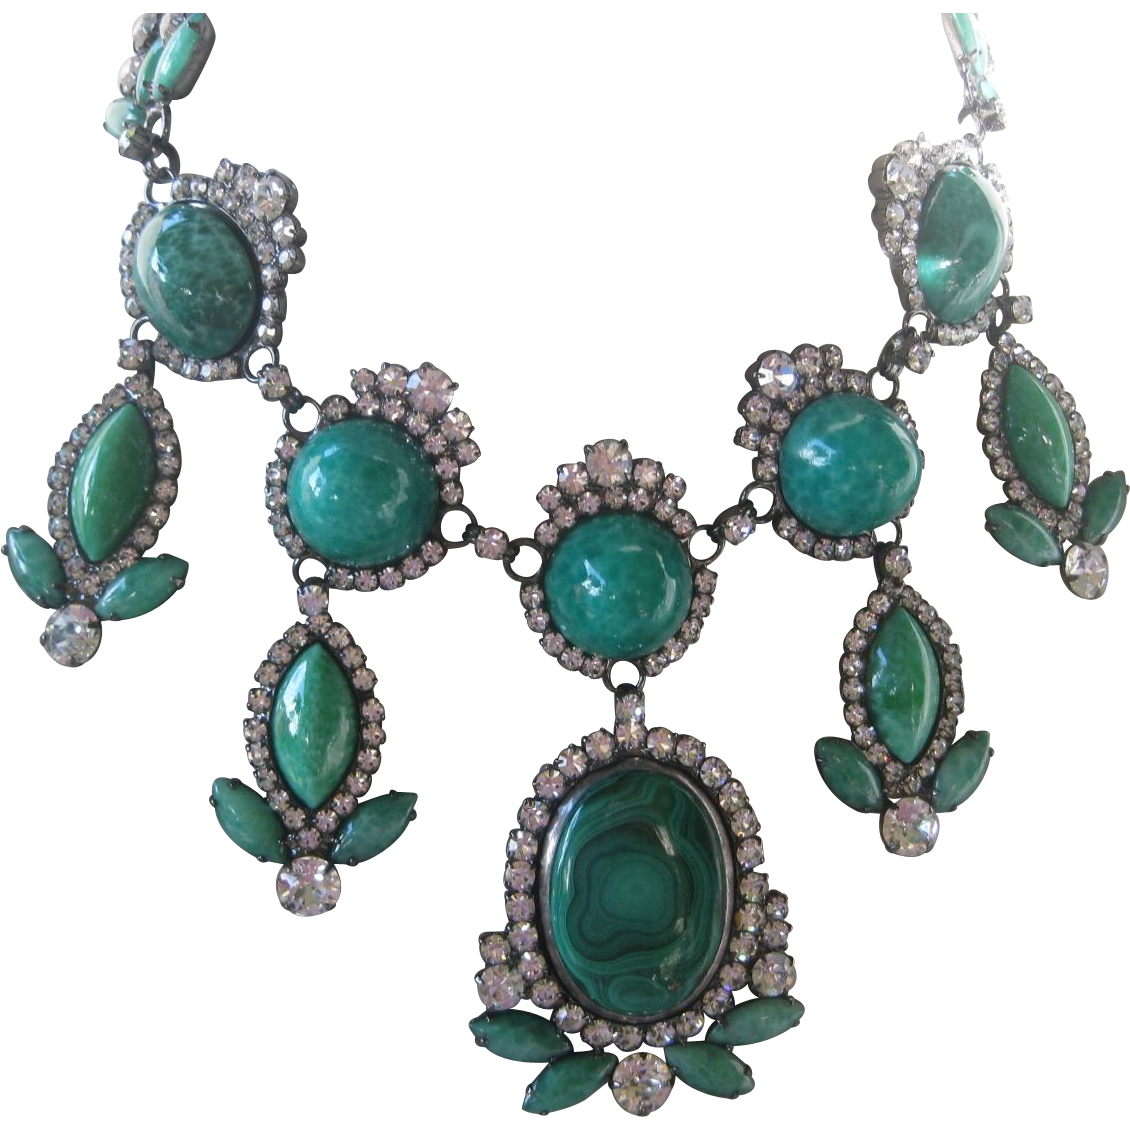 N.Y. Designer Glass Marbled Green Stones & Rhinestones Huge One Of A Kind Bib Necklace